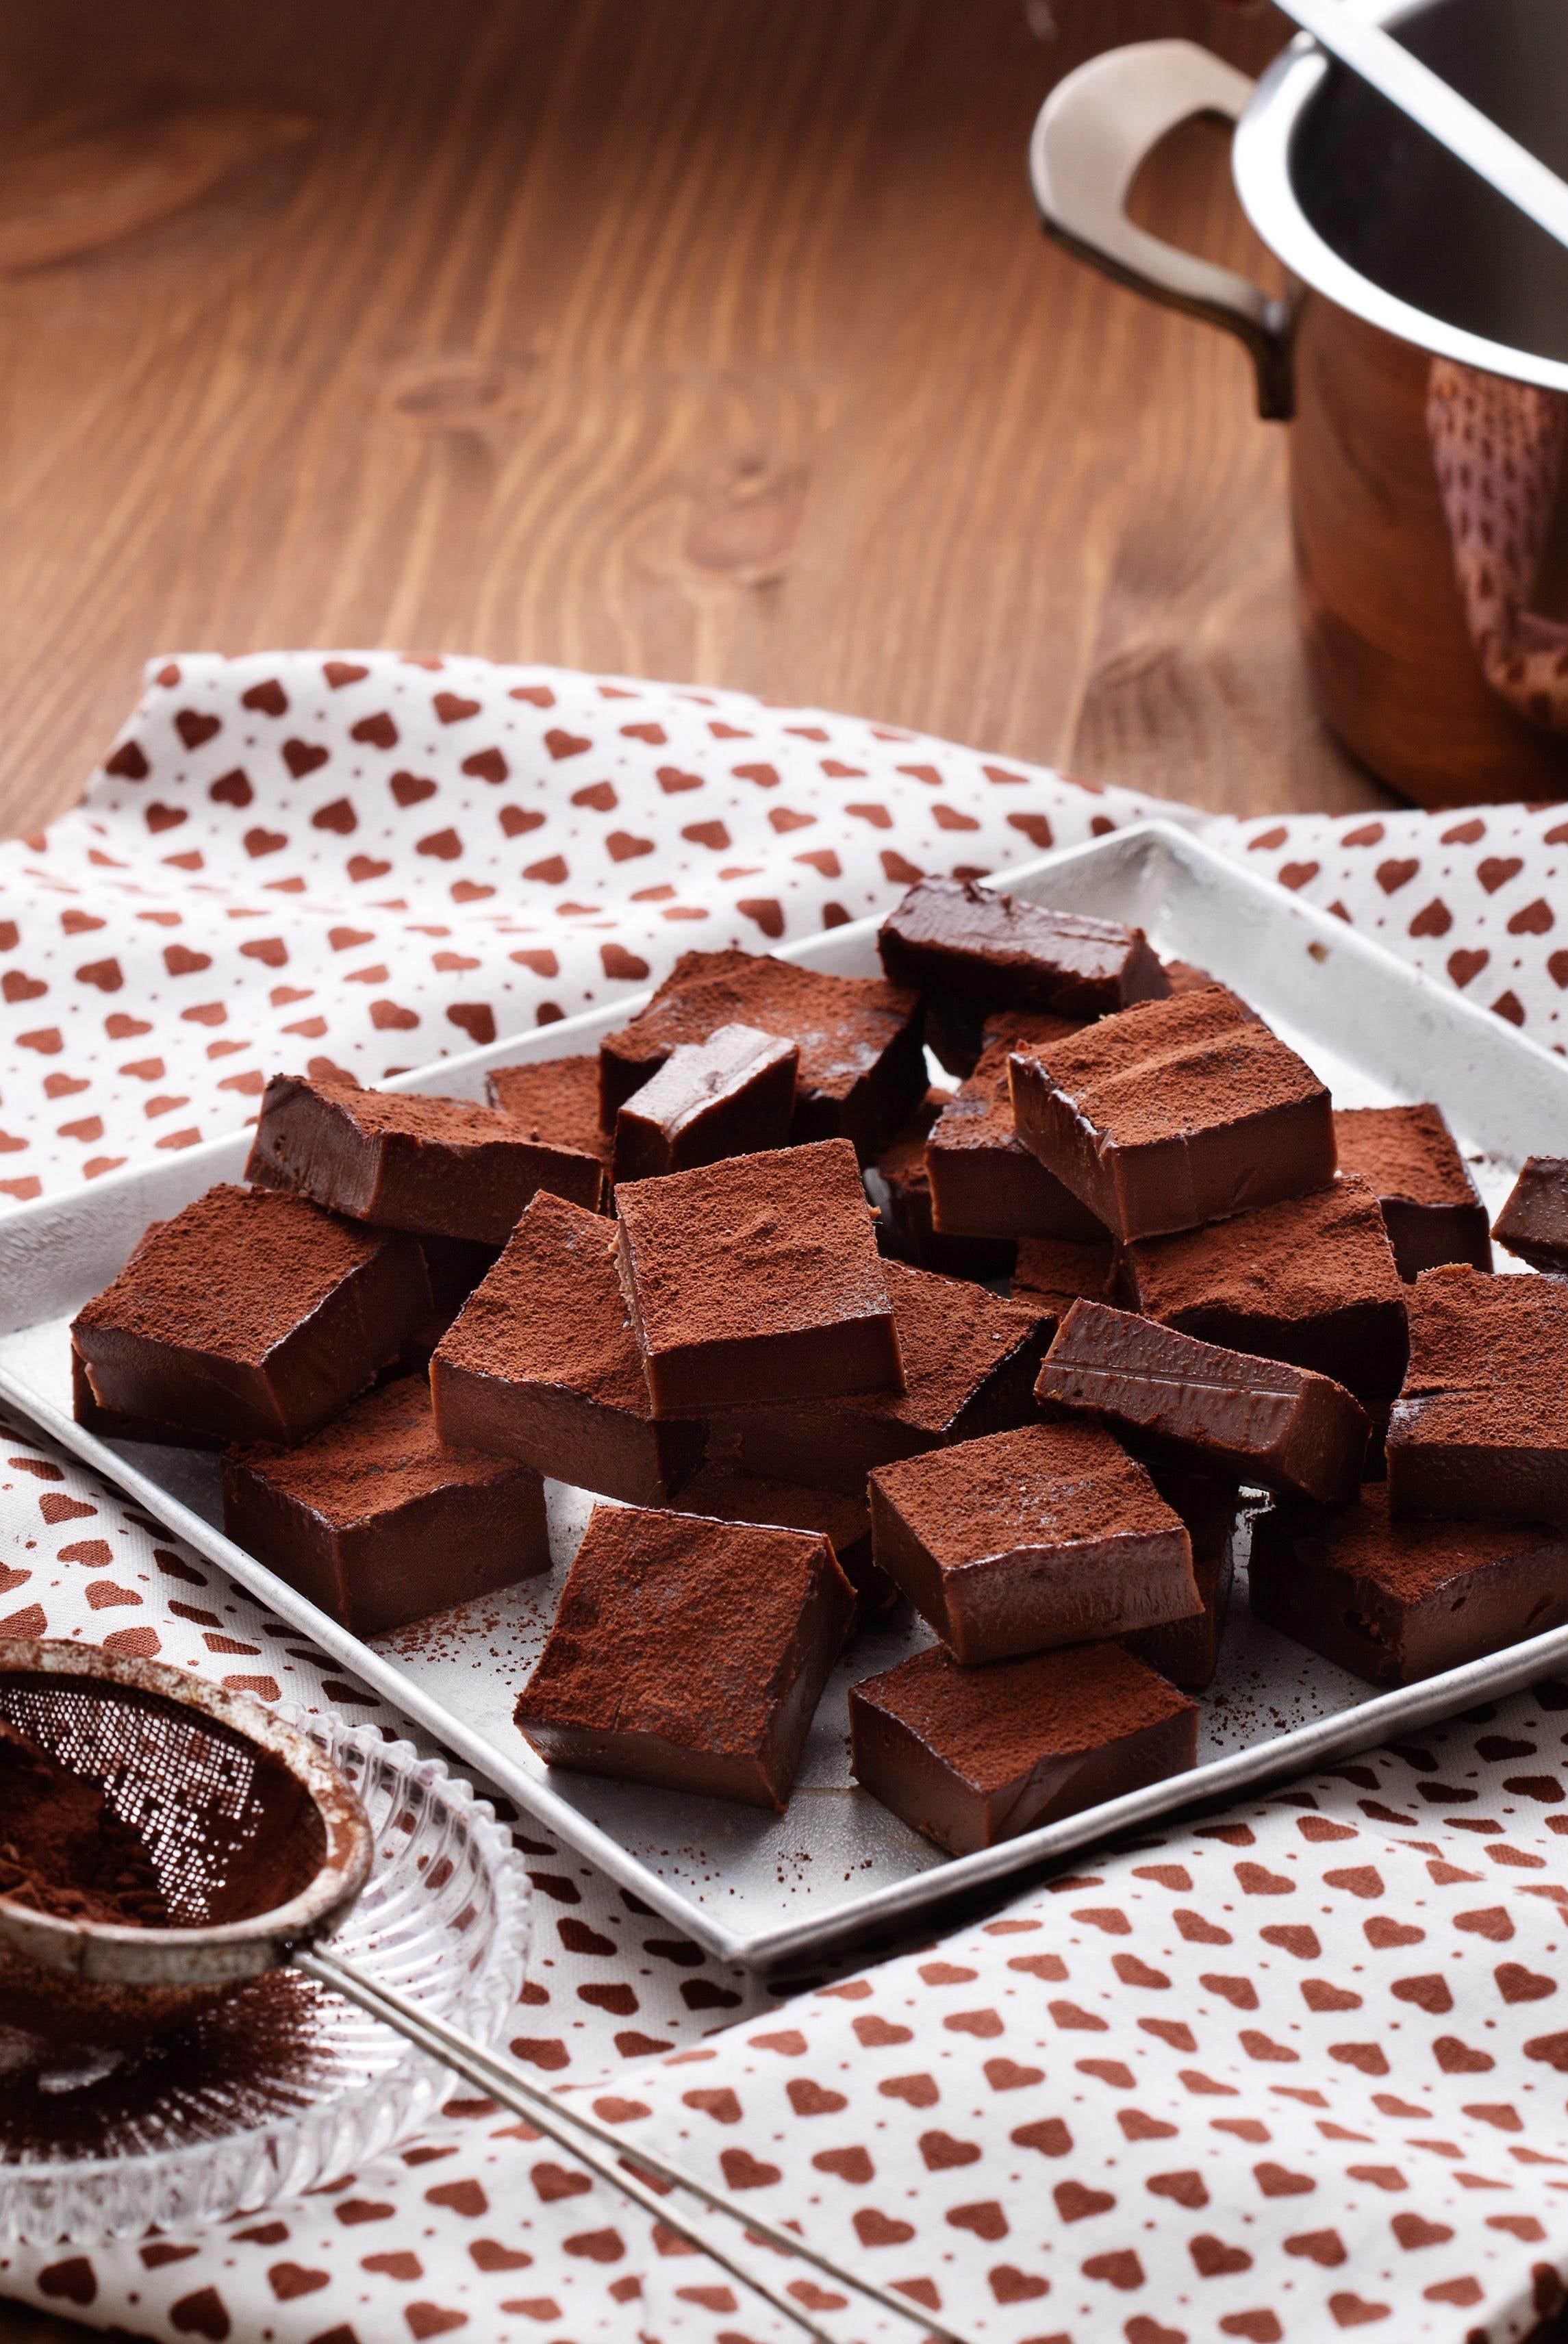 Low-carb chocolate fudge